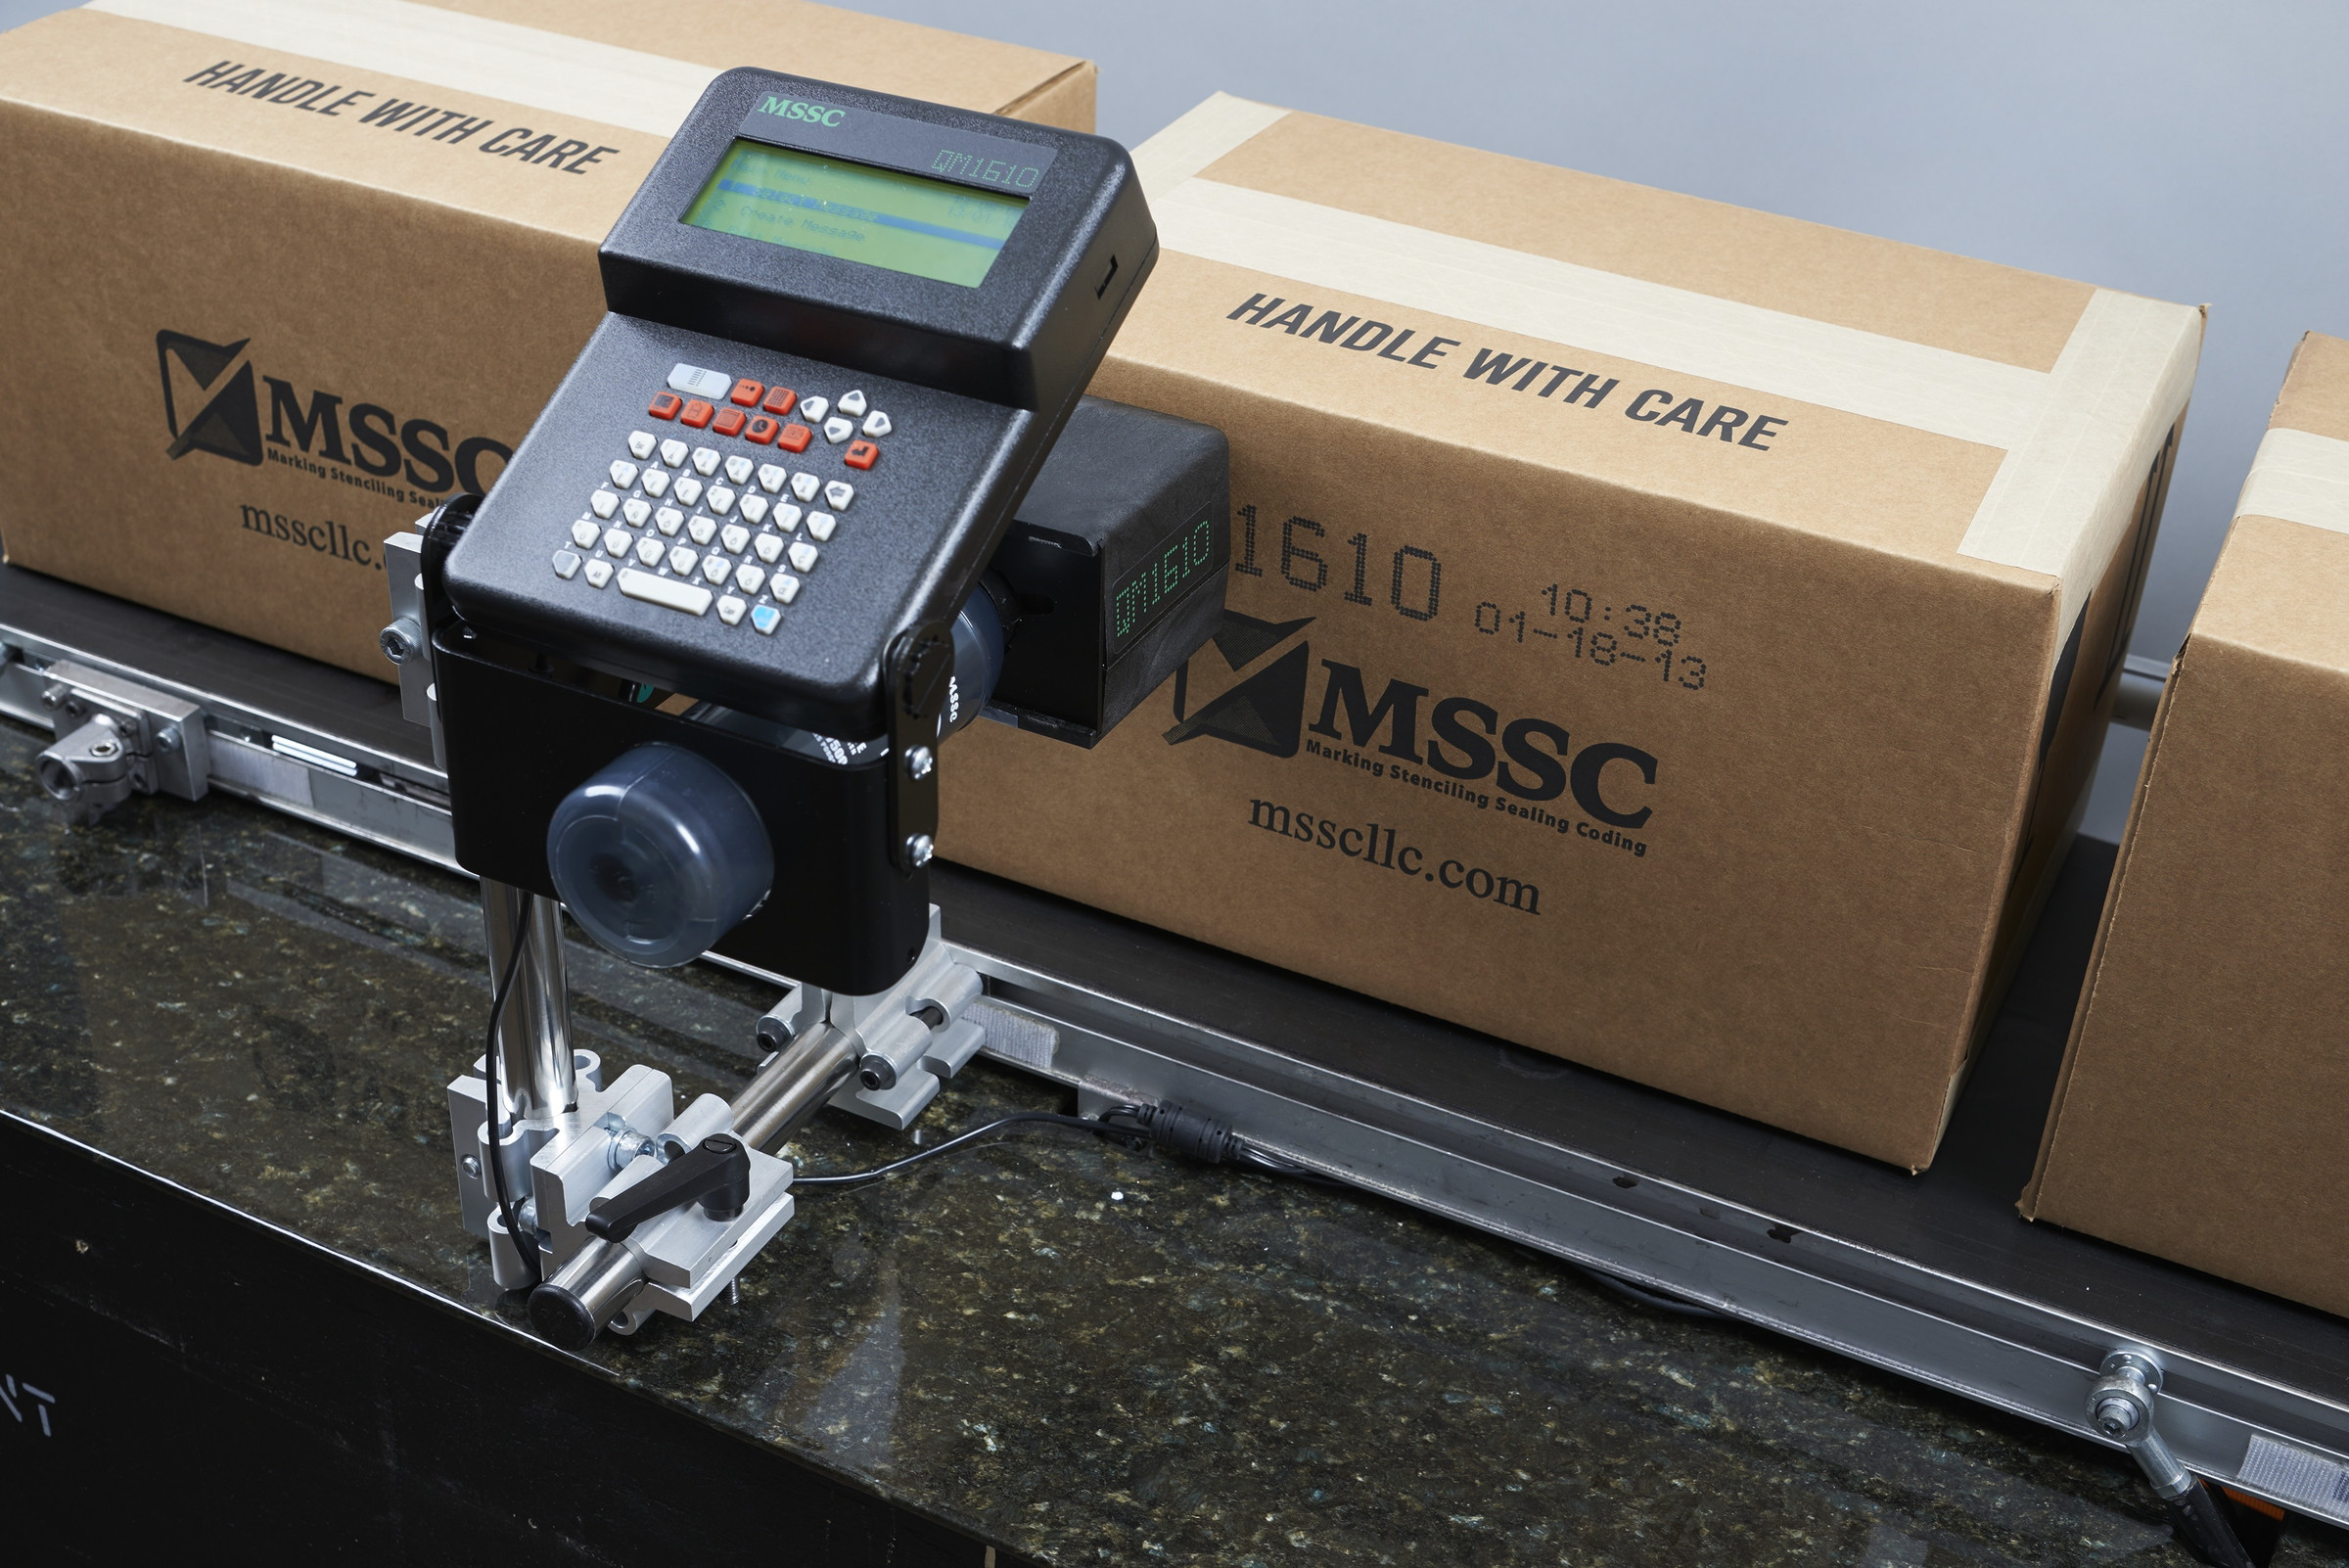 Impresora QM1610 DOD